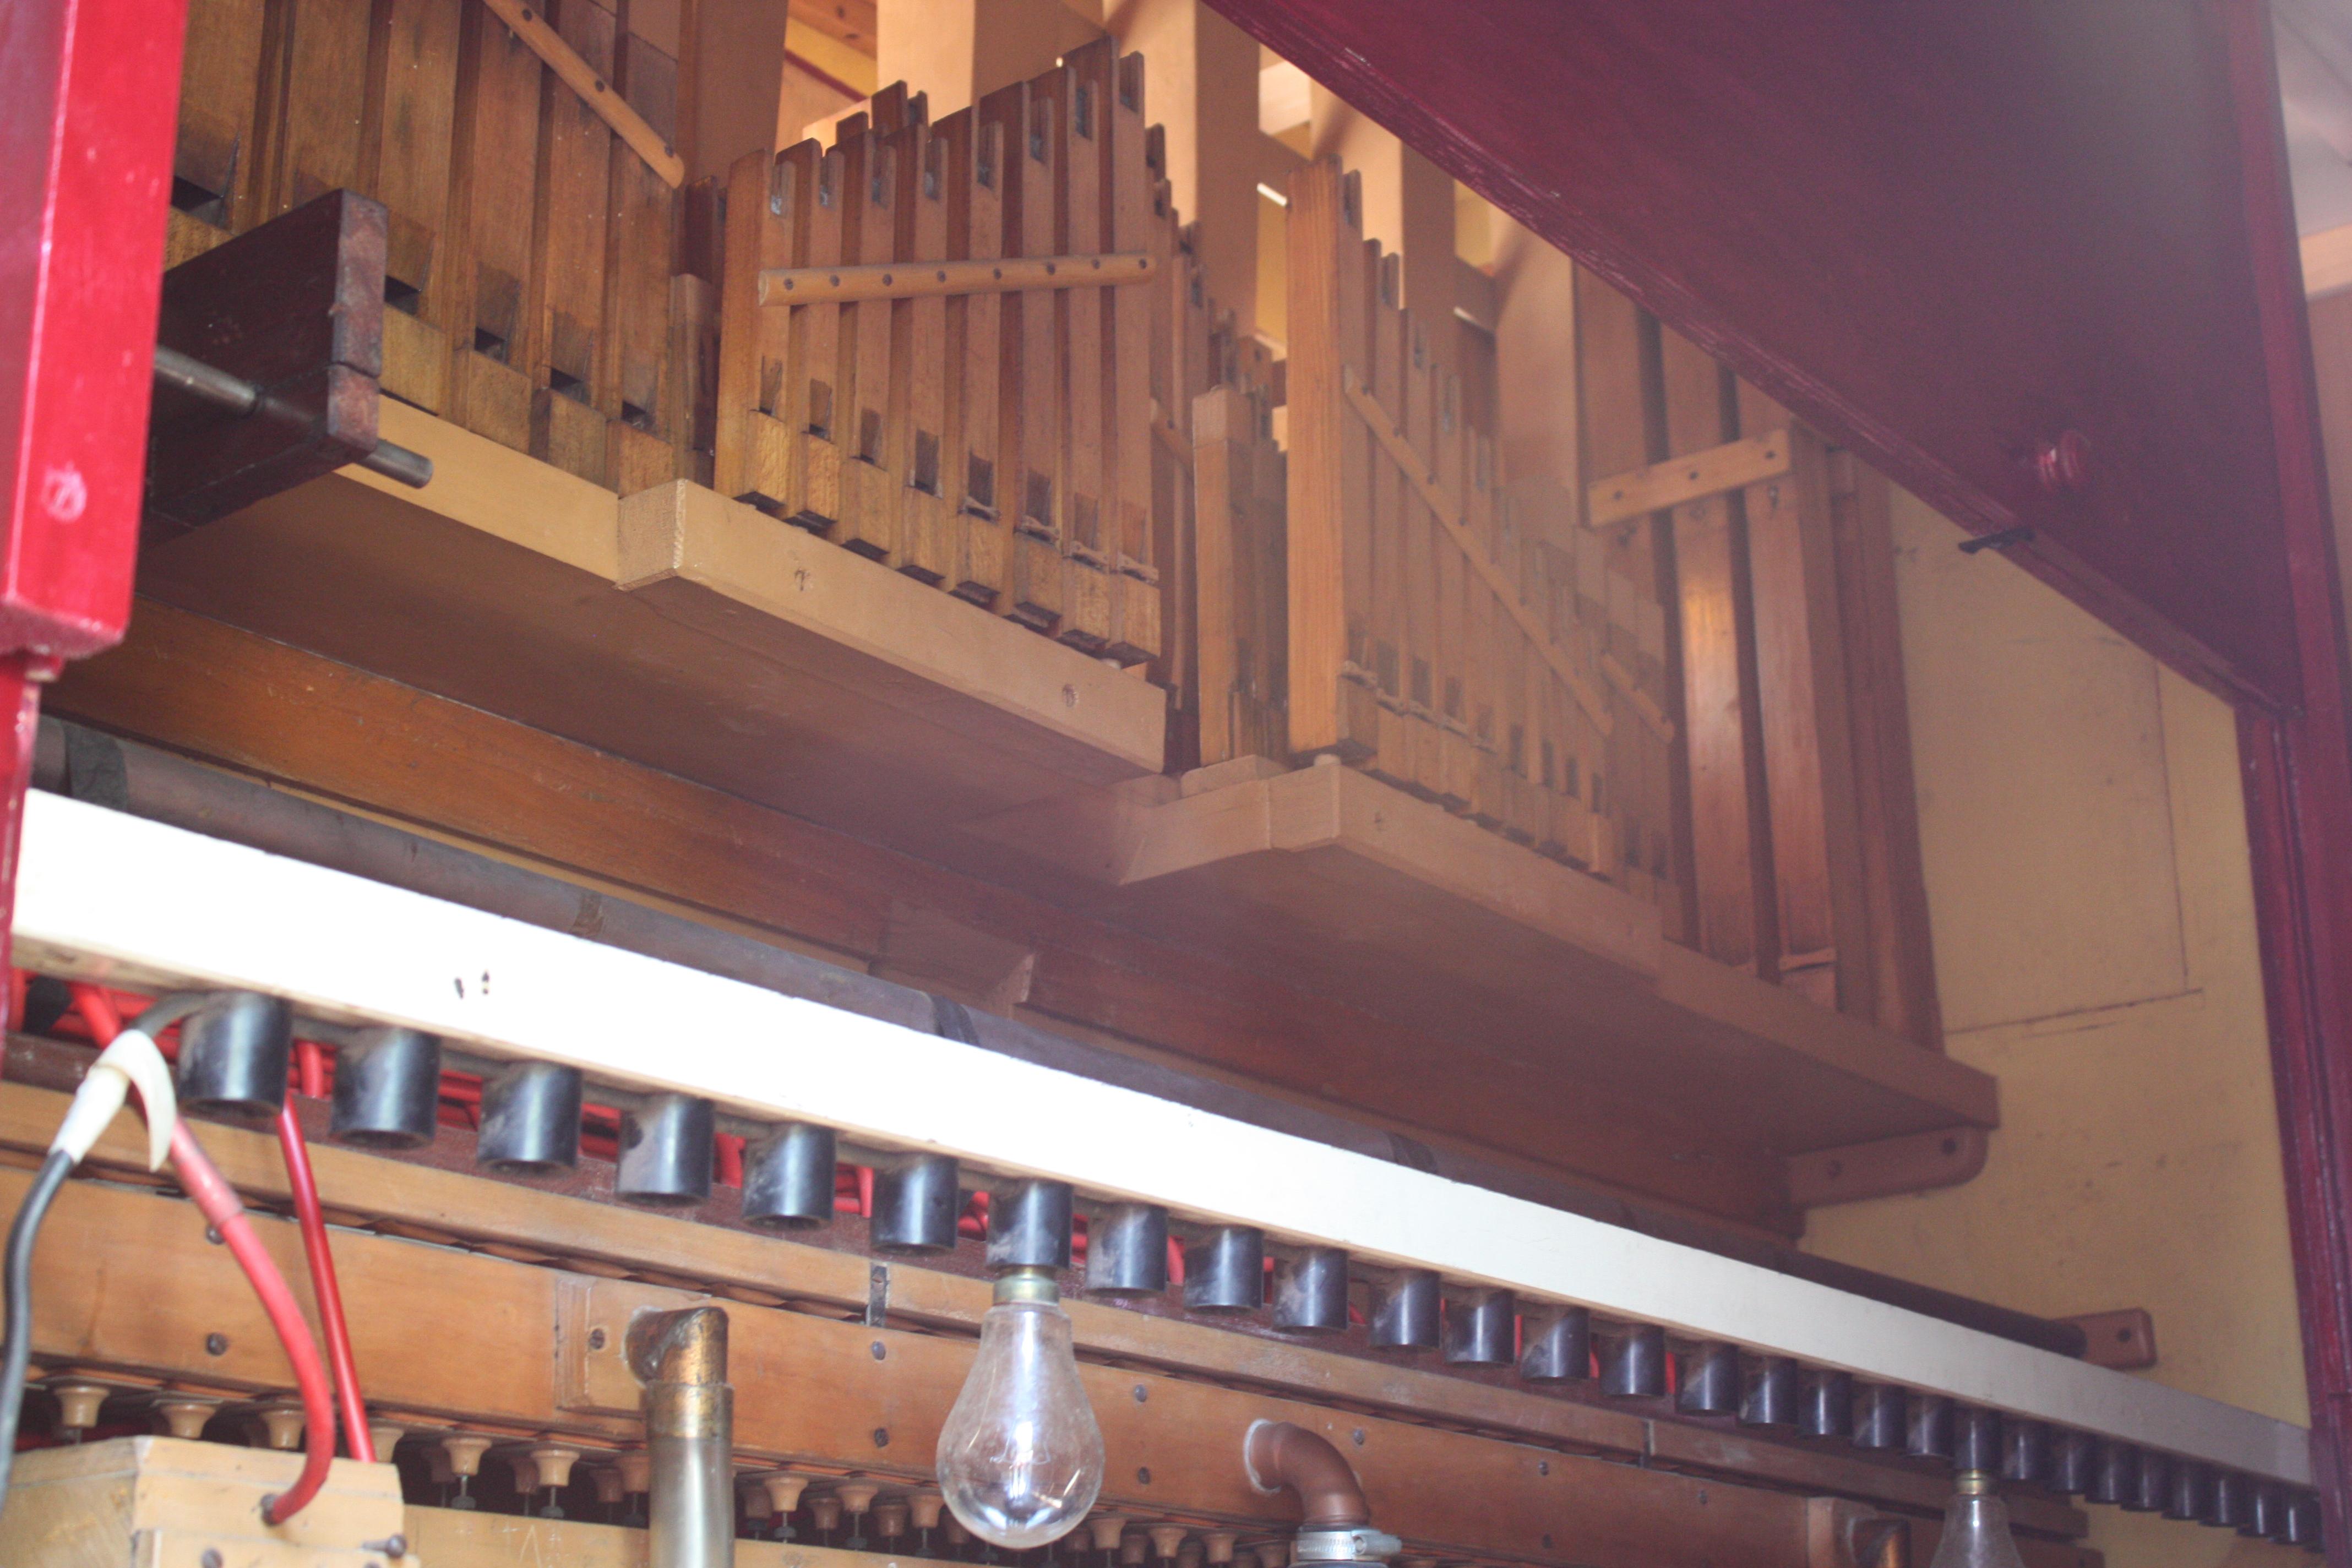 File Gavioli Amp Cie Fairground Organ Inside Pipes